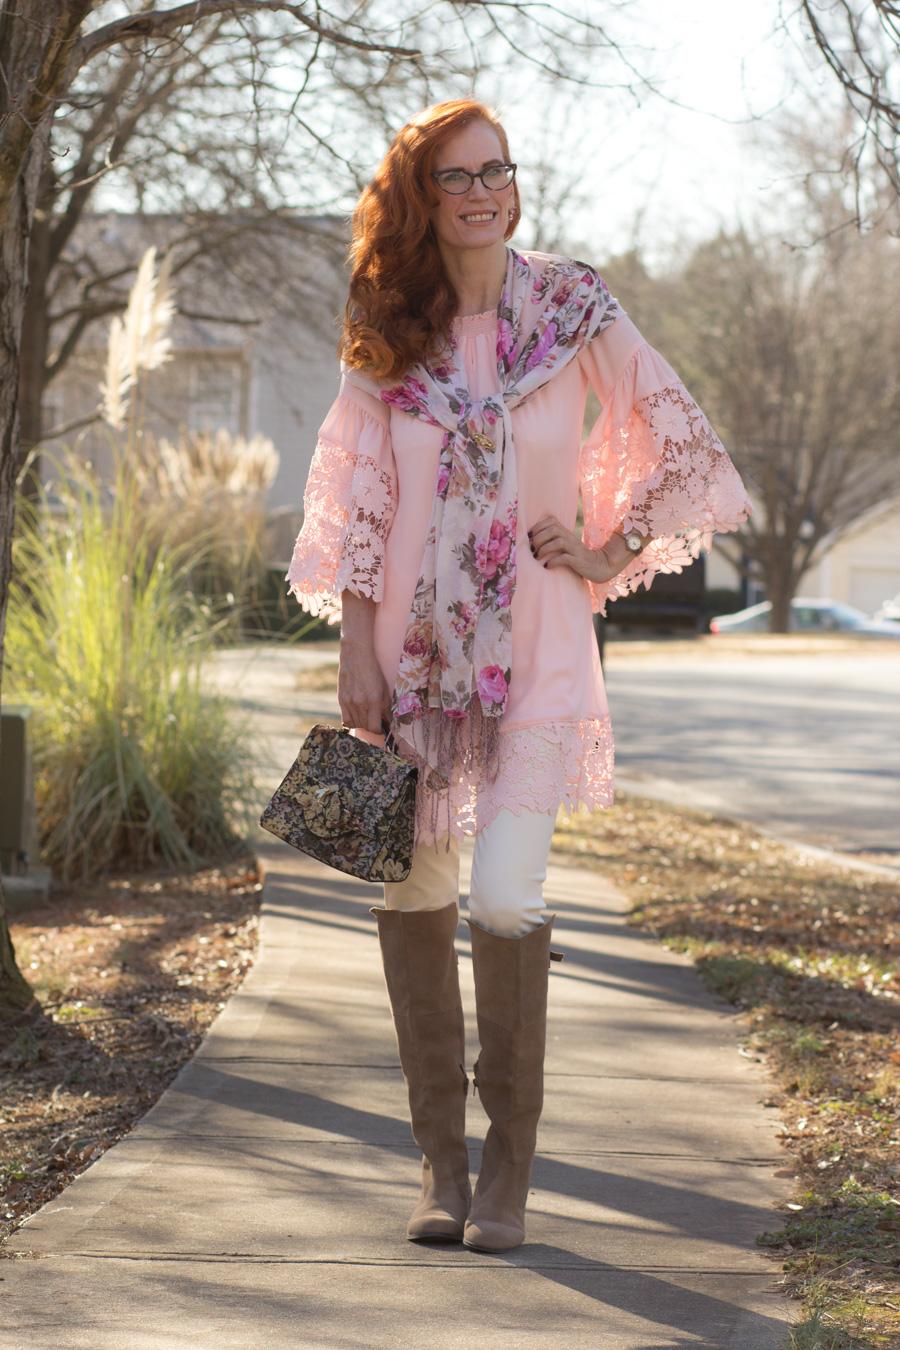 92a65b091e0 Joseph Ribkoff – 1ereAvenue – Spring '18 Tunic/Dress Styled for Winter